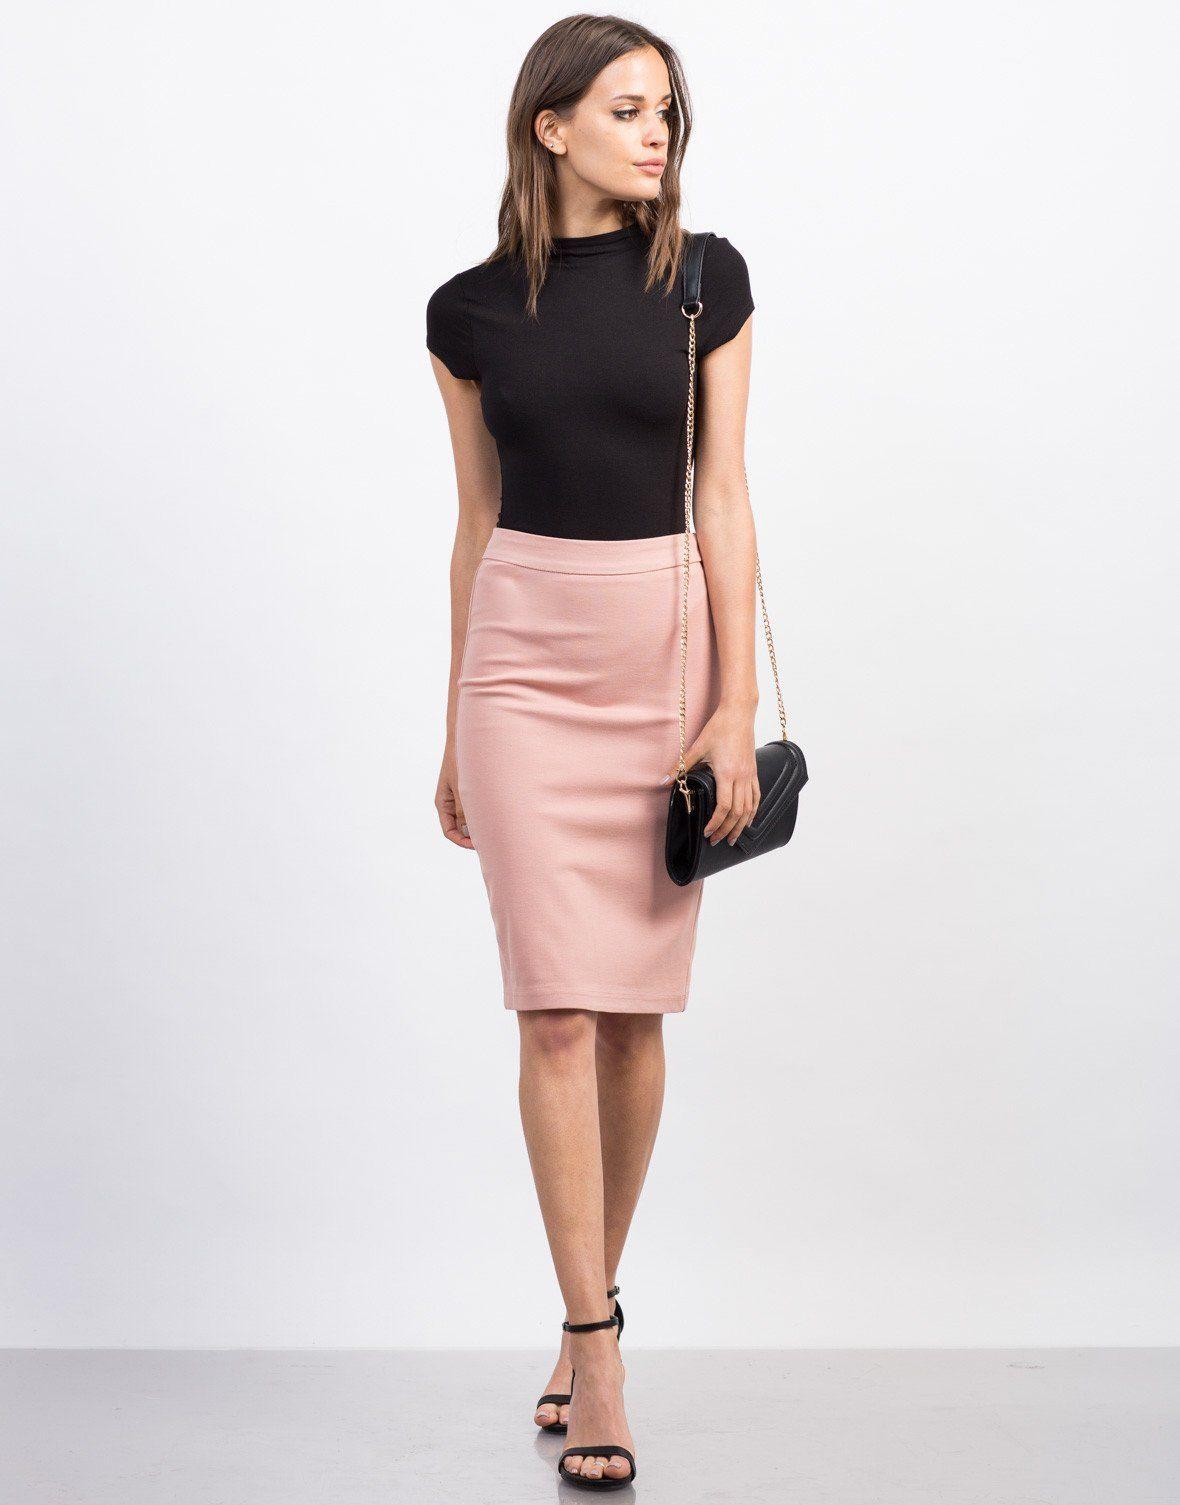 fdeef41cd9bf Front View of Side Zipper Pencil Skirt Work Chic, Knee Length Pencil Skirt,  Pencil